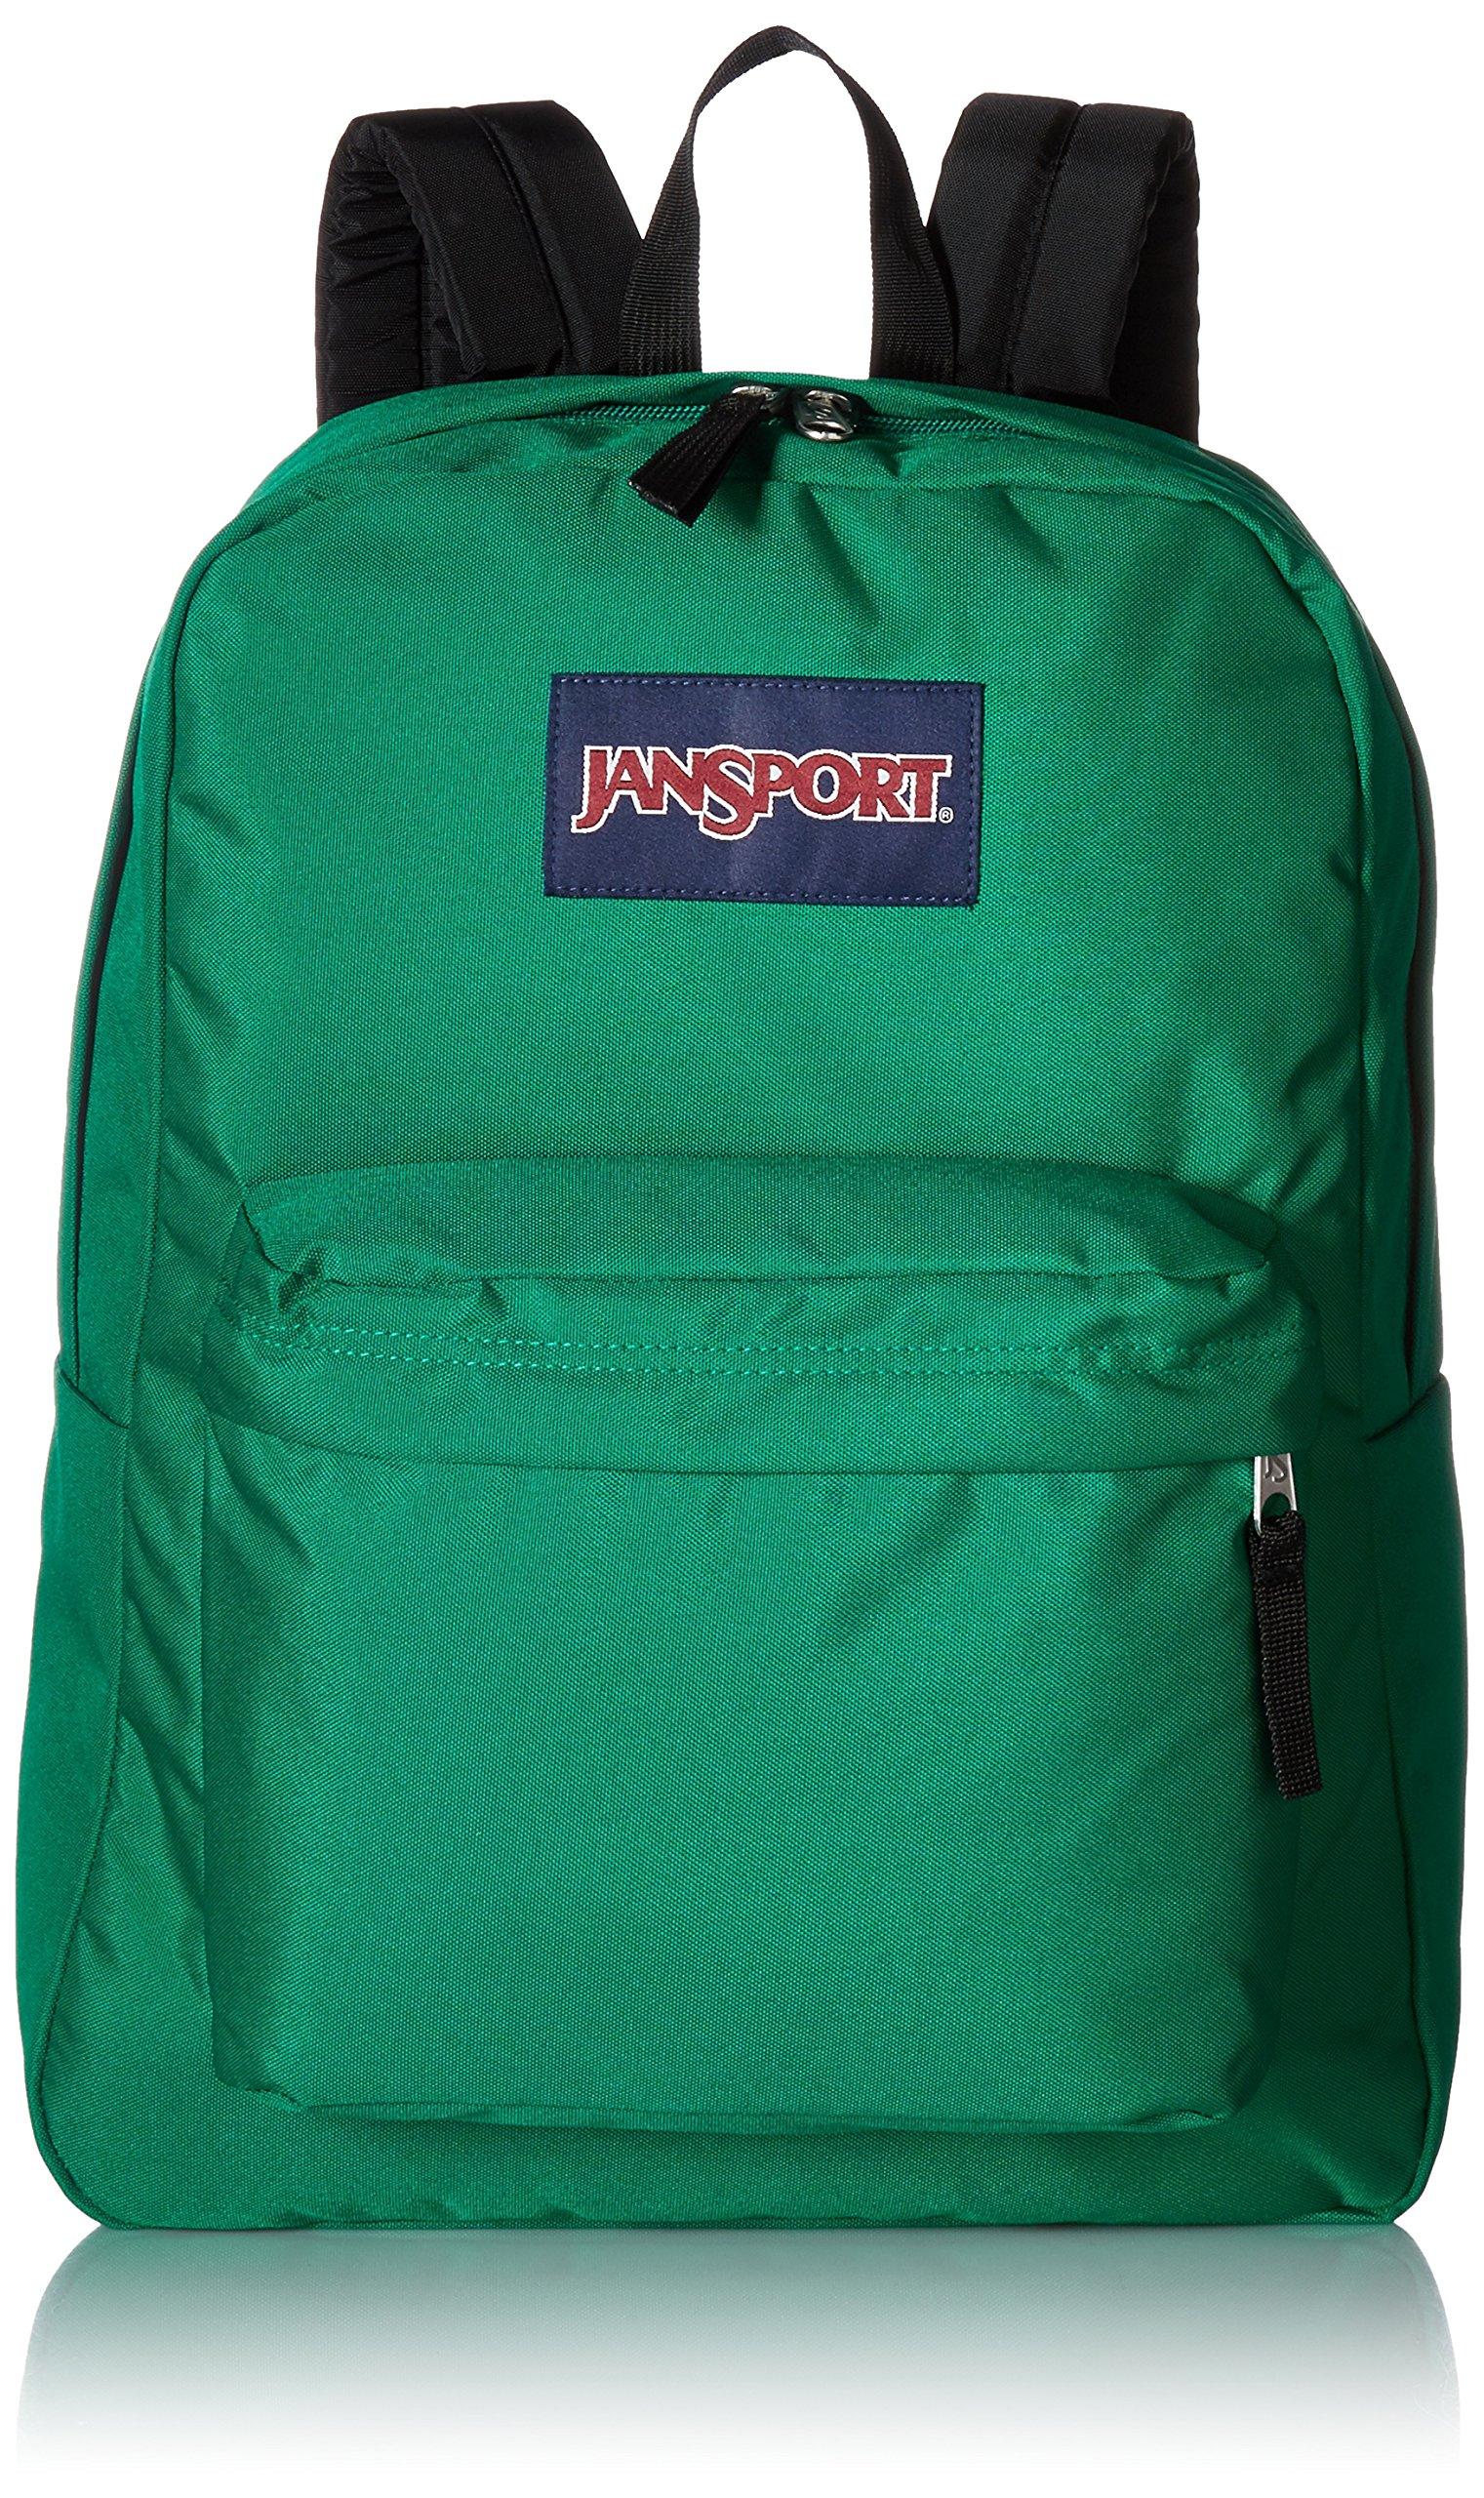 Jansport Superbreak Backpack, Amazon Green, One Size